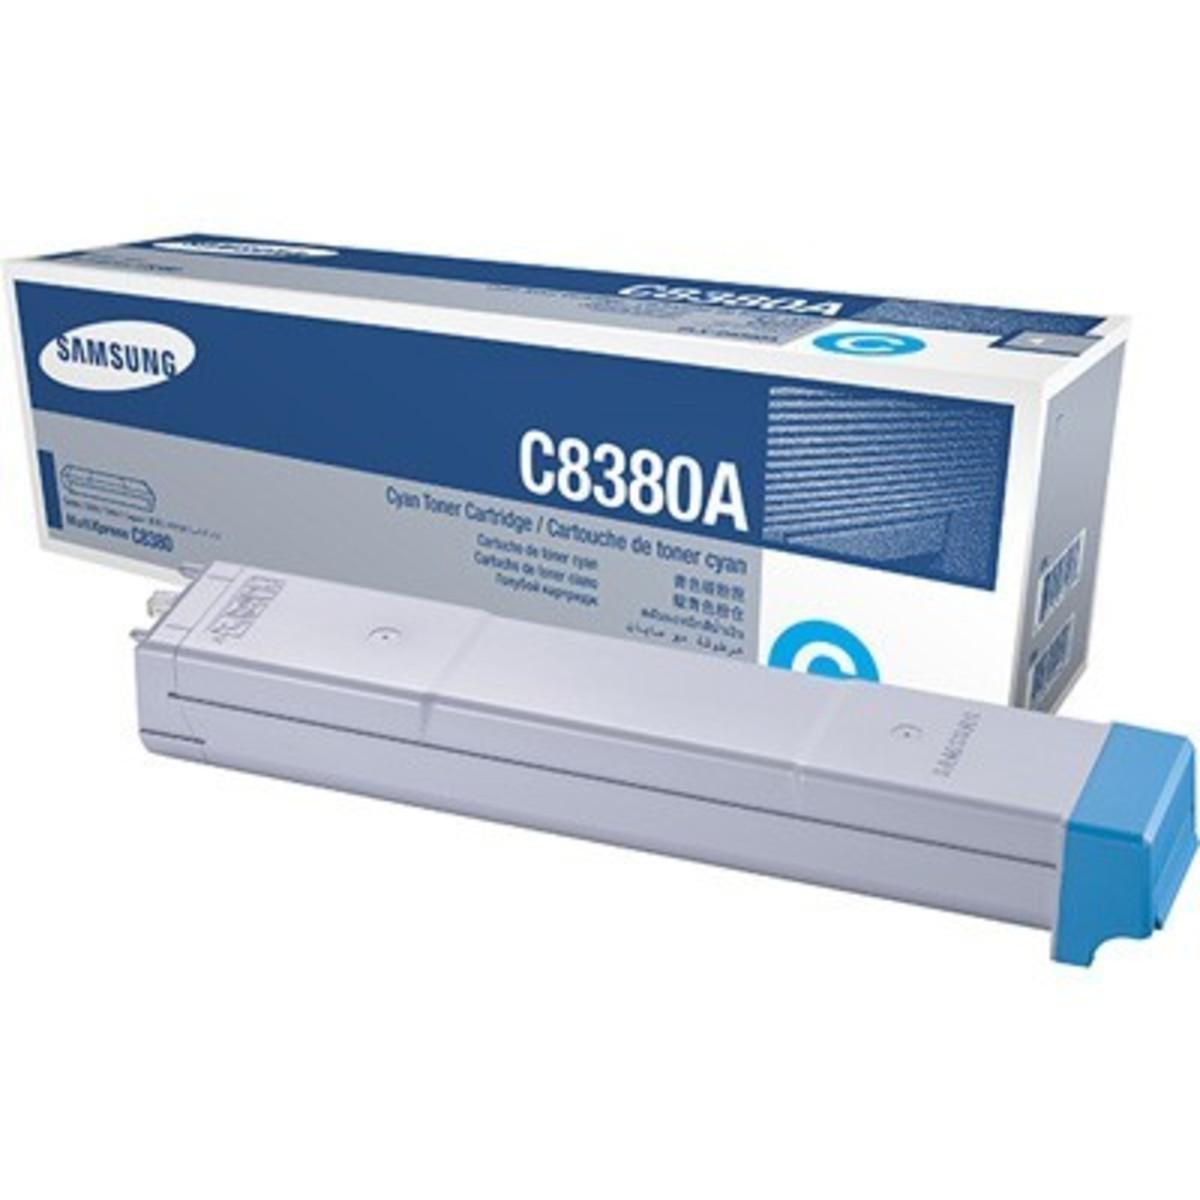 Samsung CLX-8380 Cyan Toner Cartridge